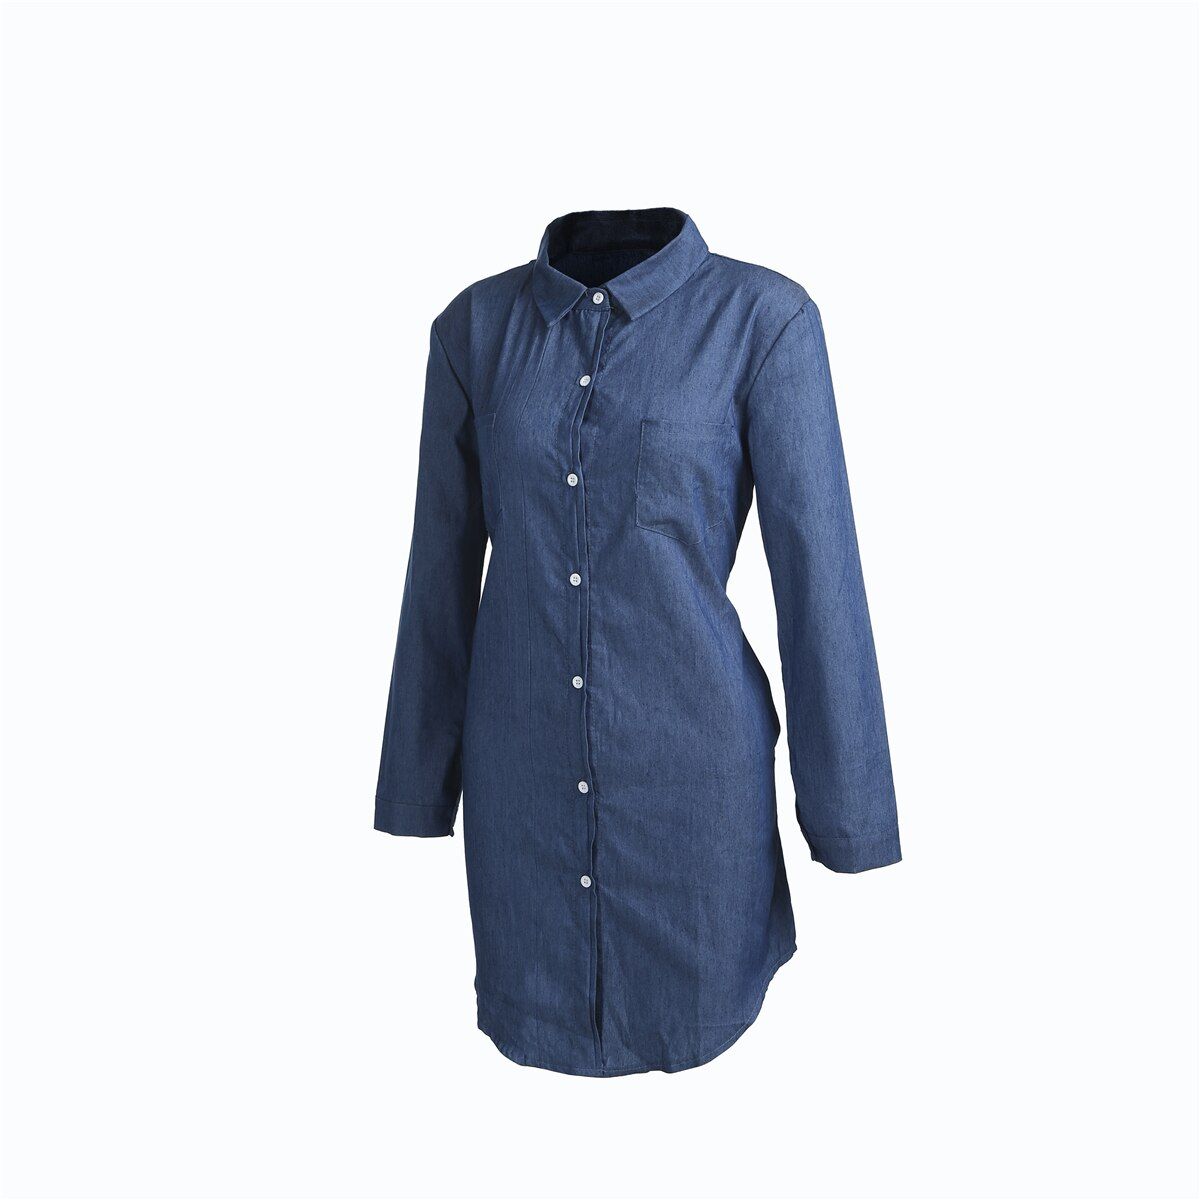 Women Denim Dresses Autumn Fashion Turn Down Collar Mini Dress Lapel Long Tops Shirt Ladies Long Sleeve Holiday Mini Dress S-2XL 2